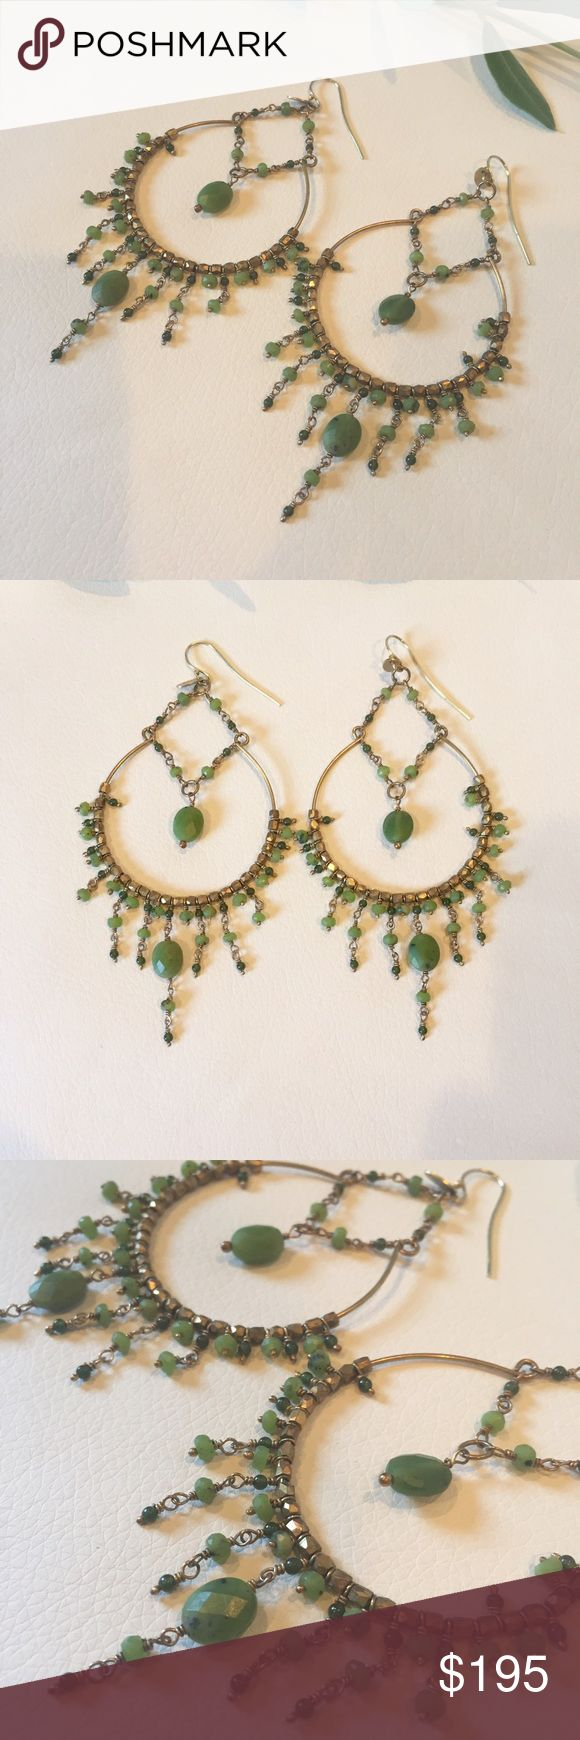 Anthropologie UK designer peridot earrings NWOT Anthropologie UK designer gold & peridot earrings NWOT Anthropologie Jewelry Earrings